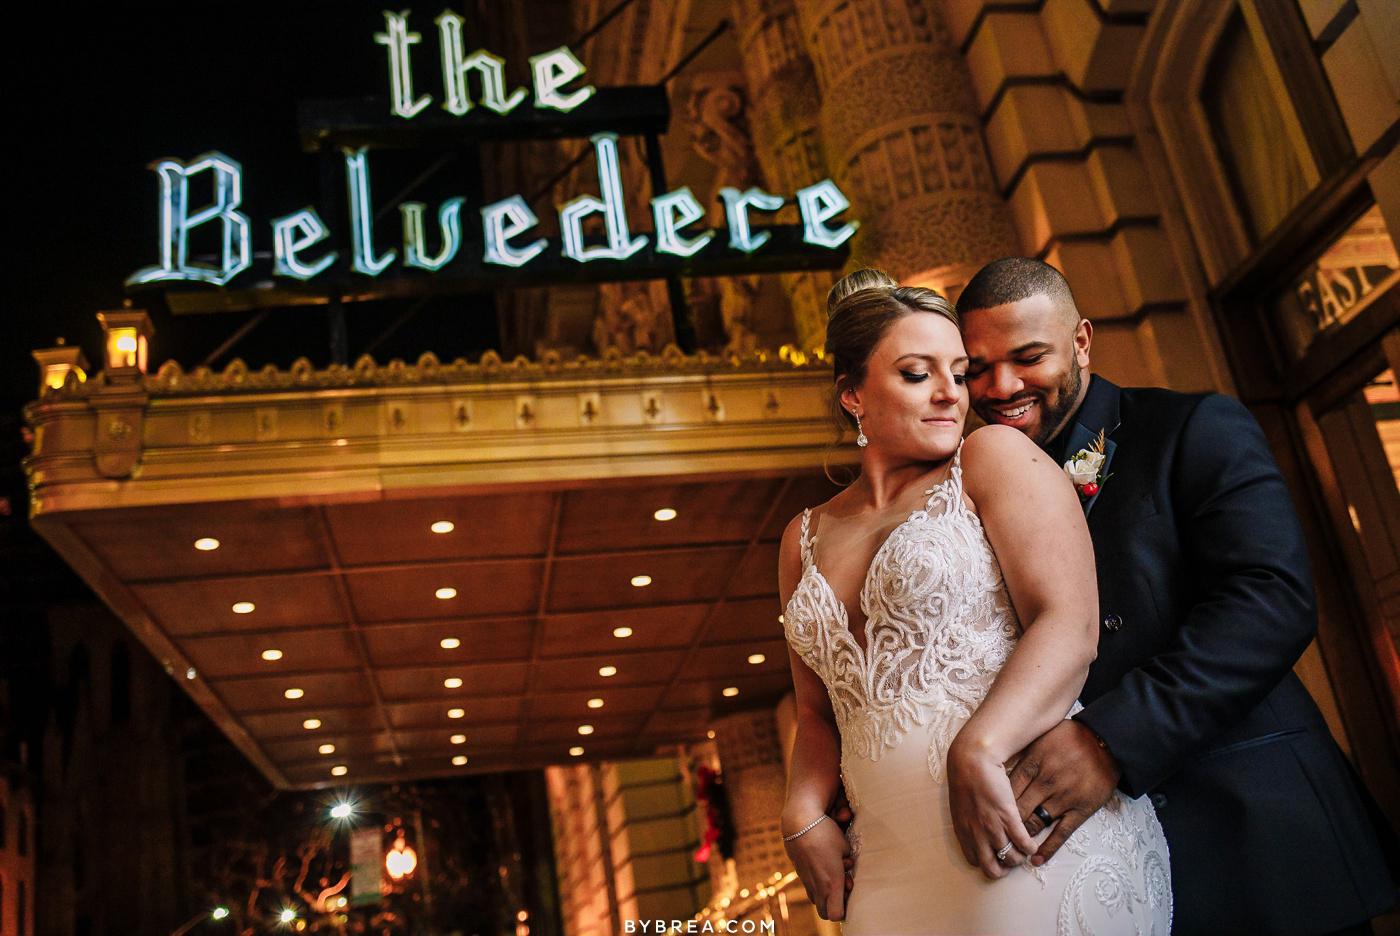 Belvedere wedding portrait